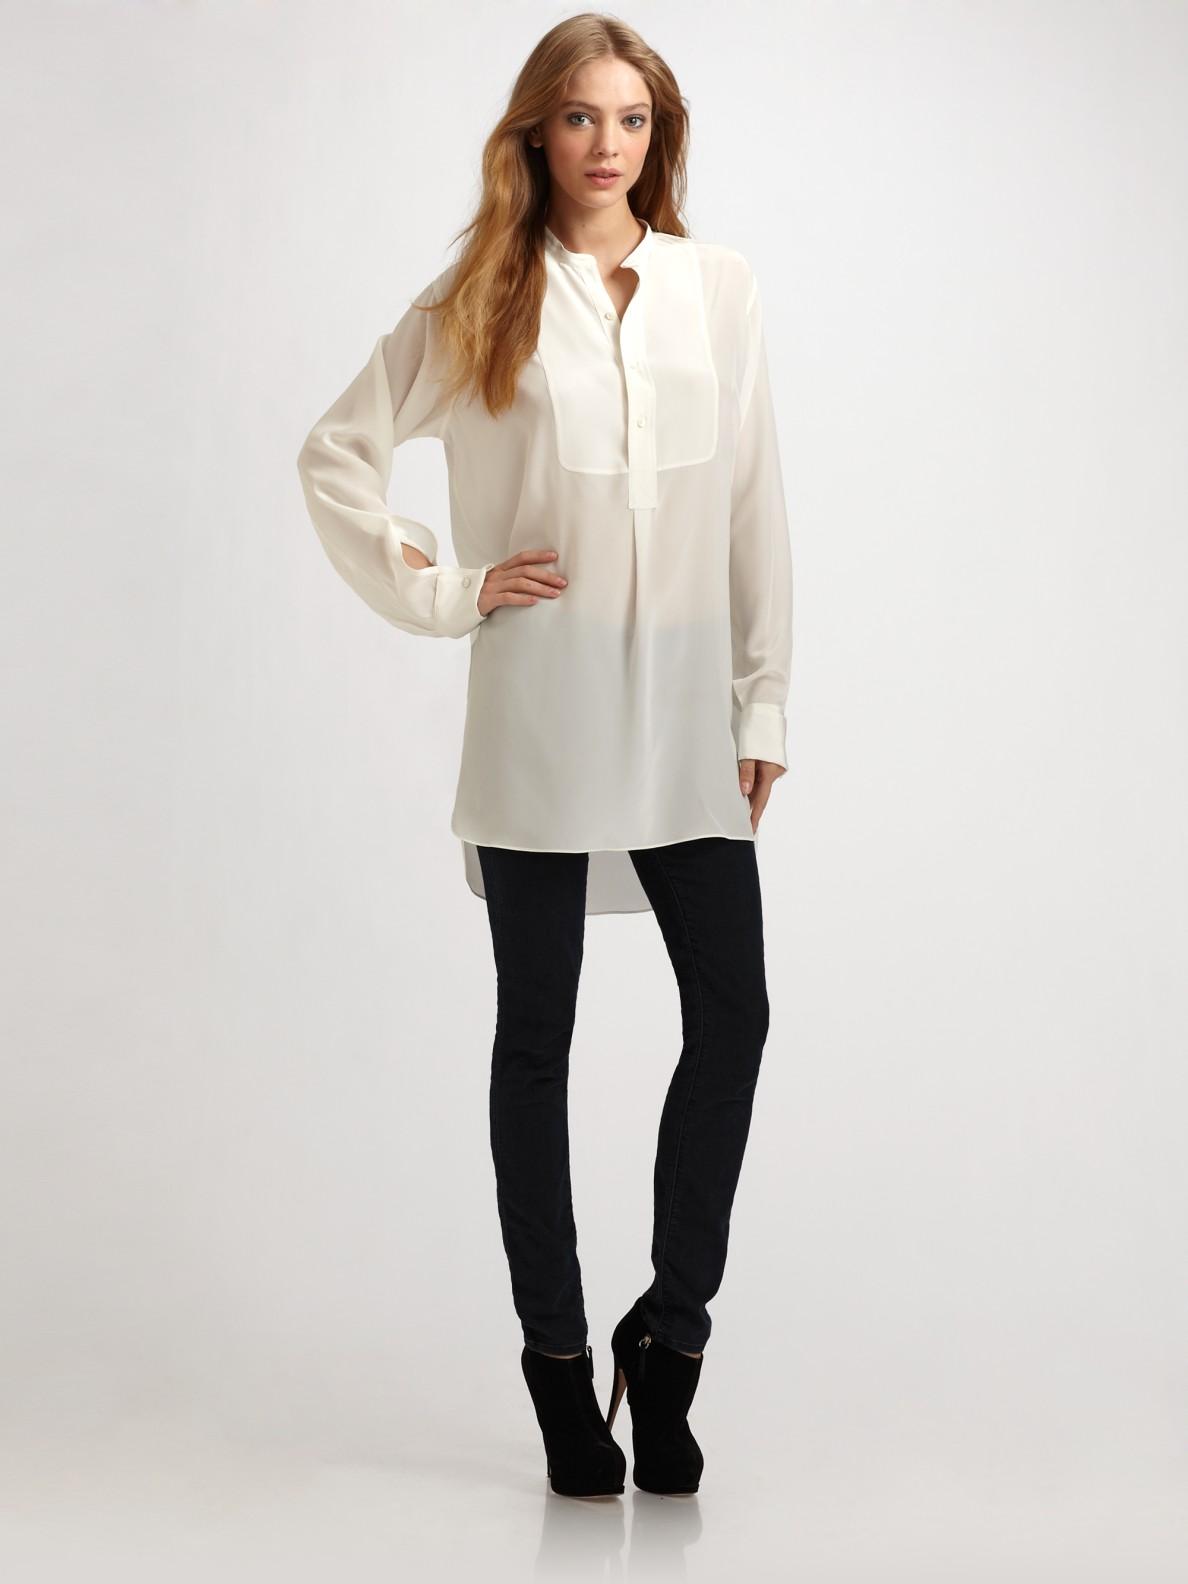 Elegant  About Pendleton Sheer Romance Blouse  Long Sleeve For Women